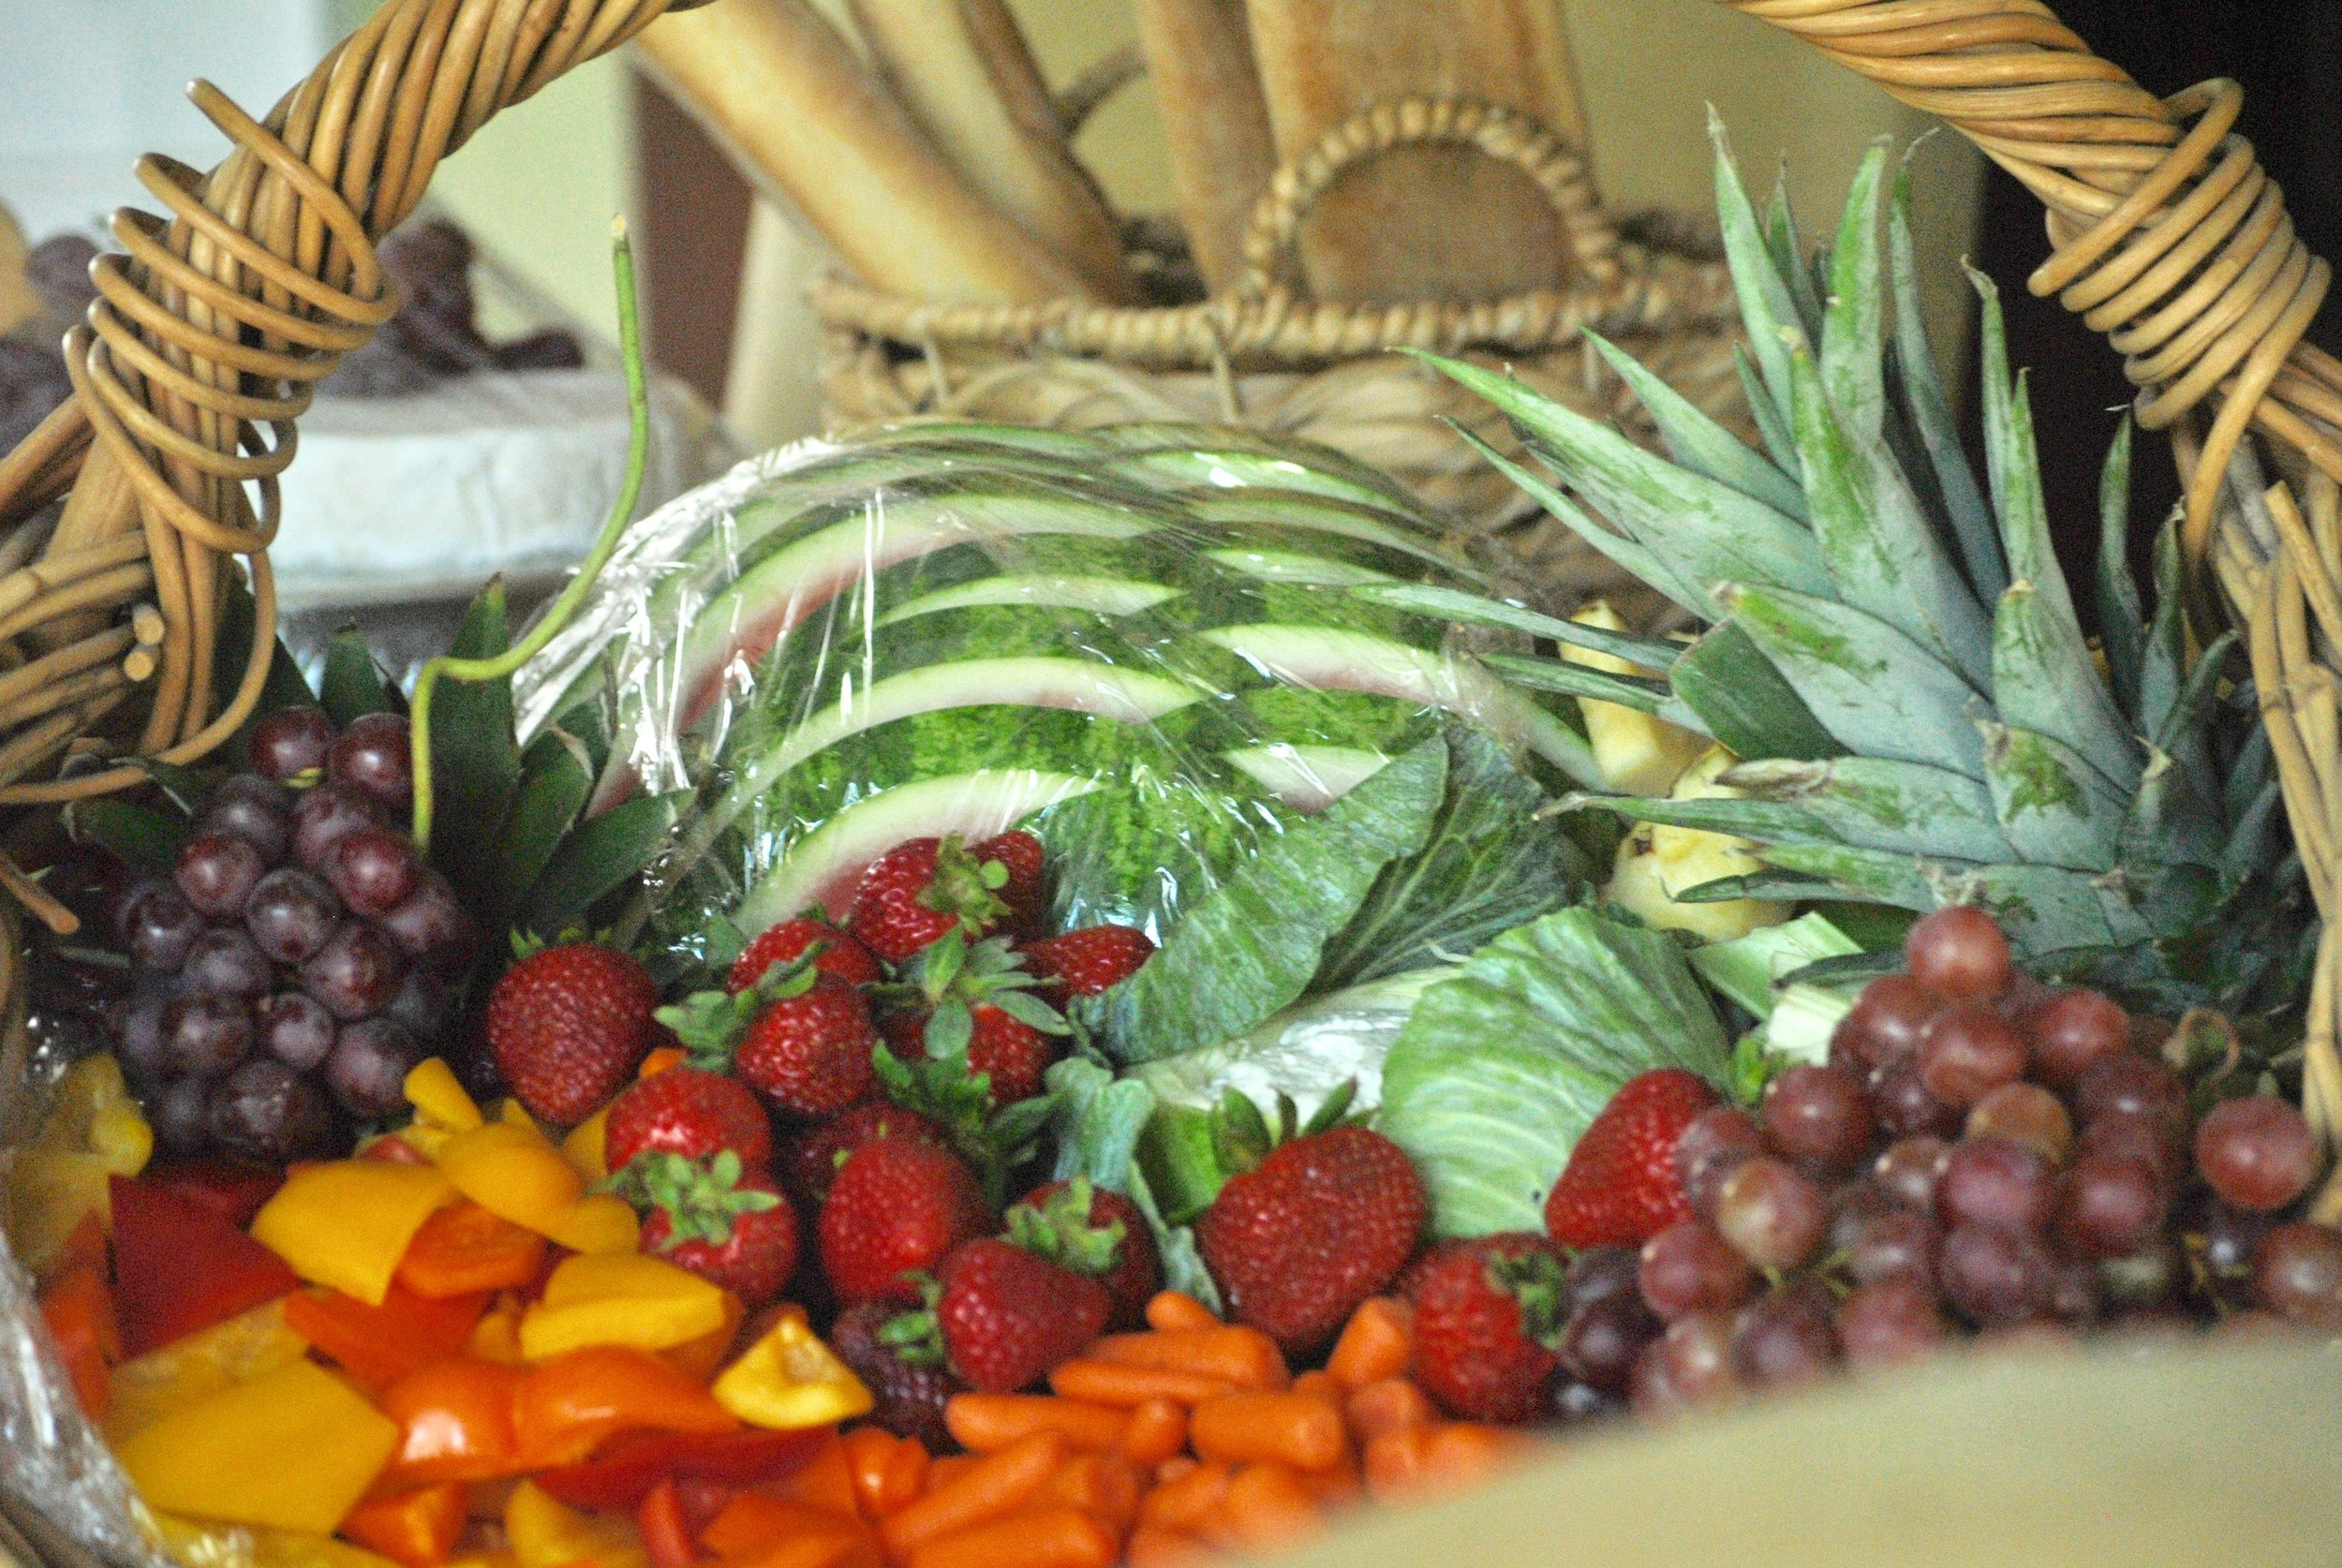 Fruit and Veggie basket for wedding